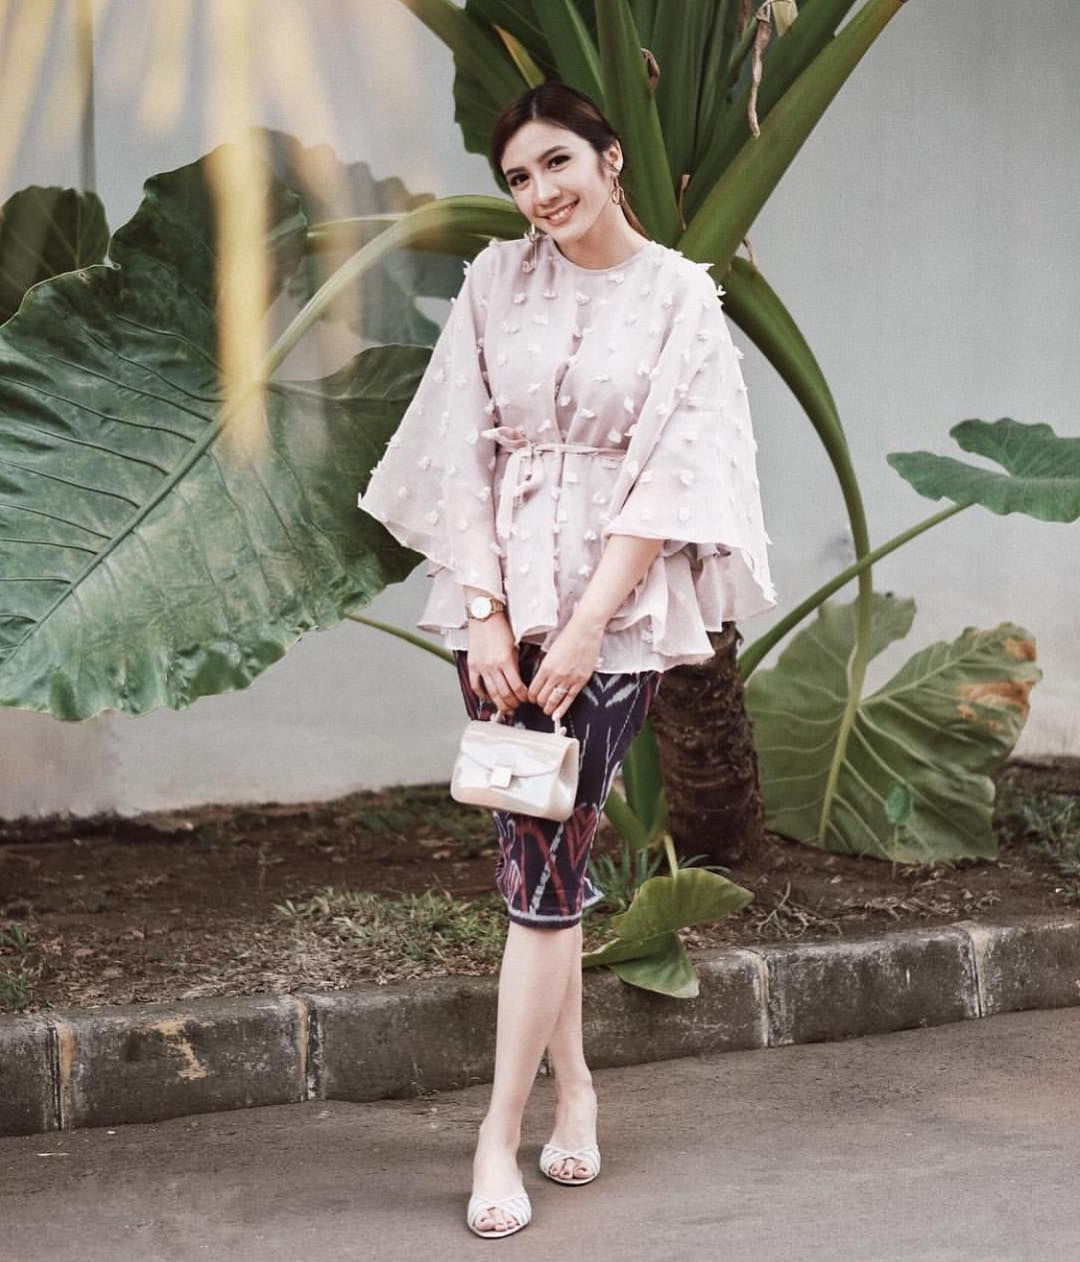 Inspirasi Baju Lebaran Brokat 2018 Drdp 17 Model Baju Pesta Brokat 2018 Edisi Gaun Blouse